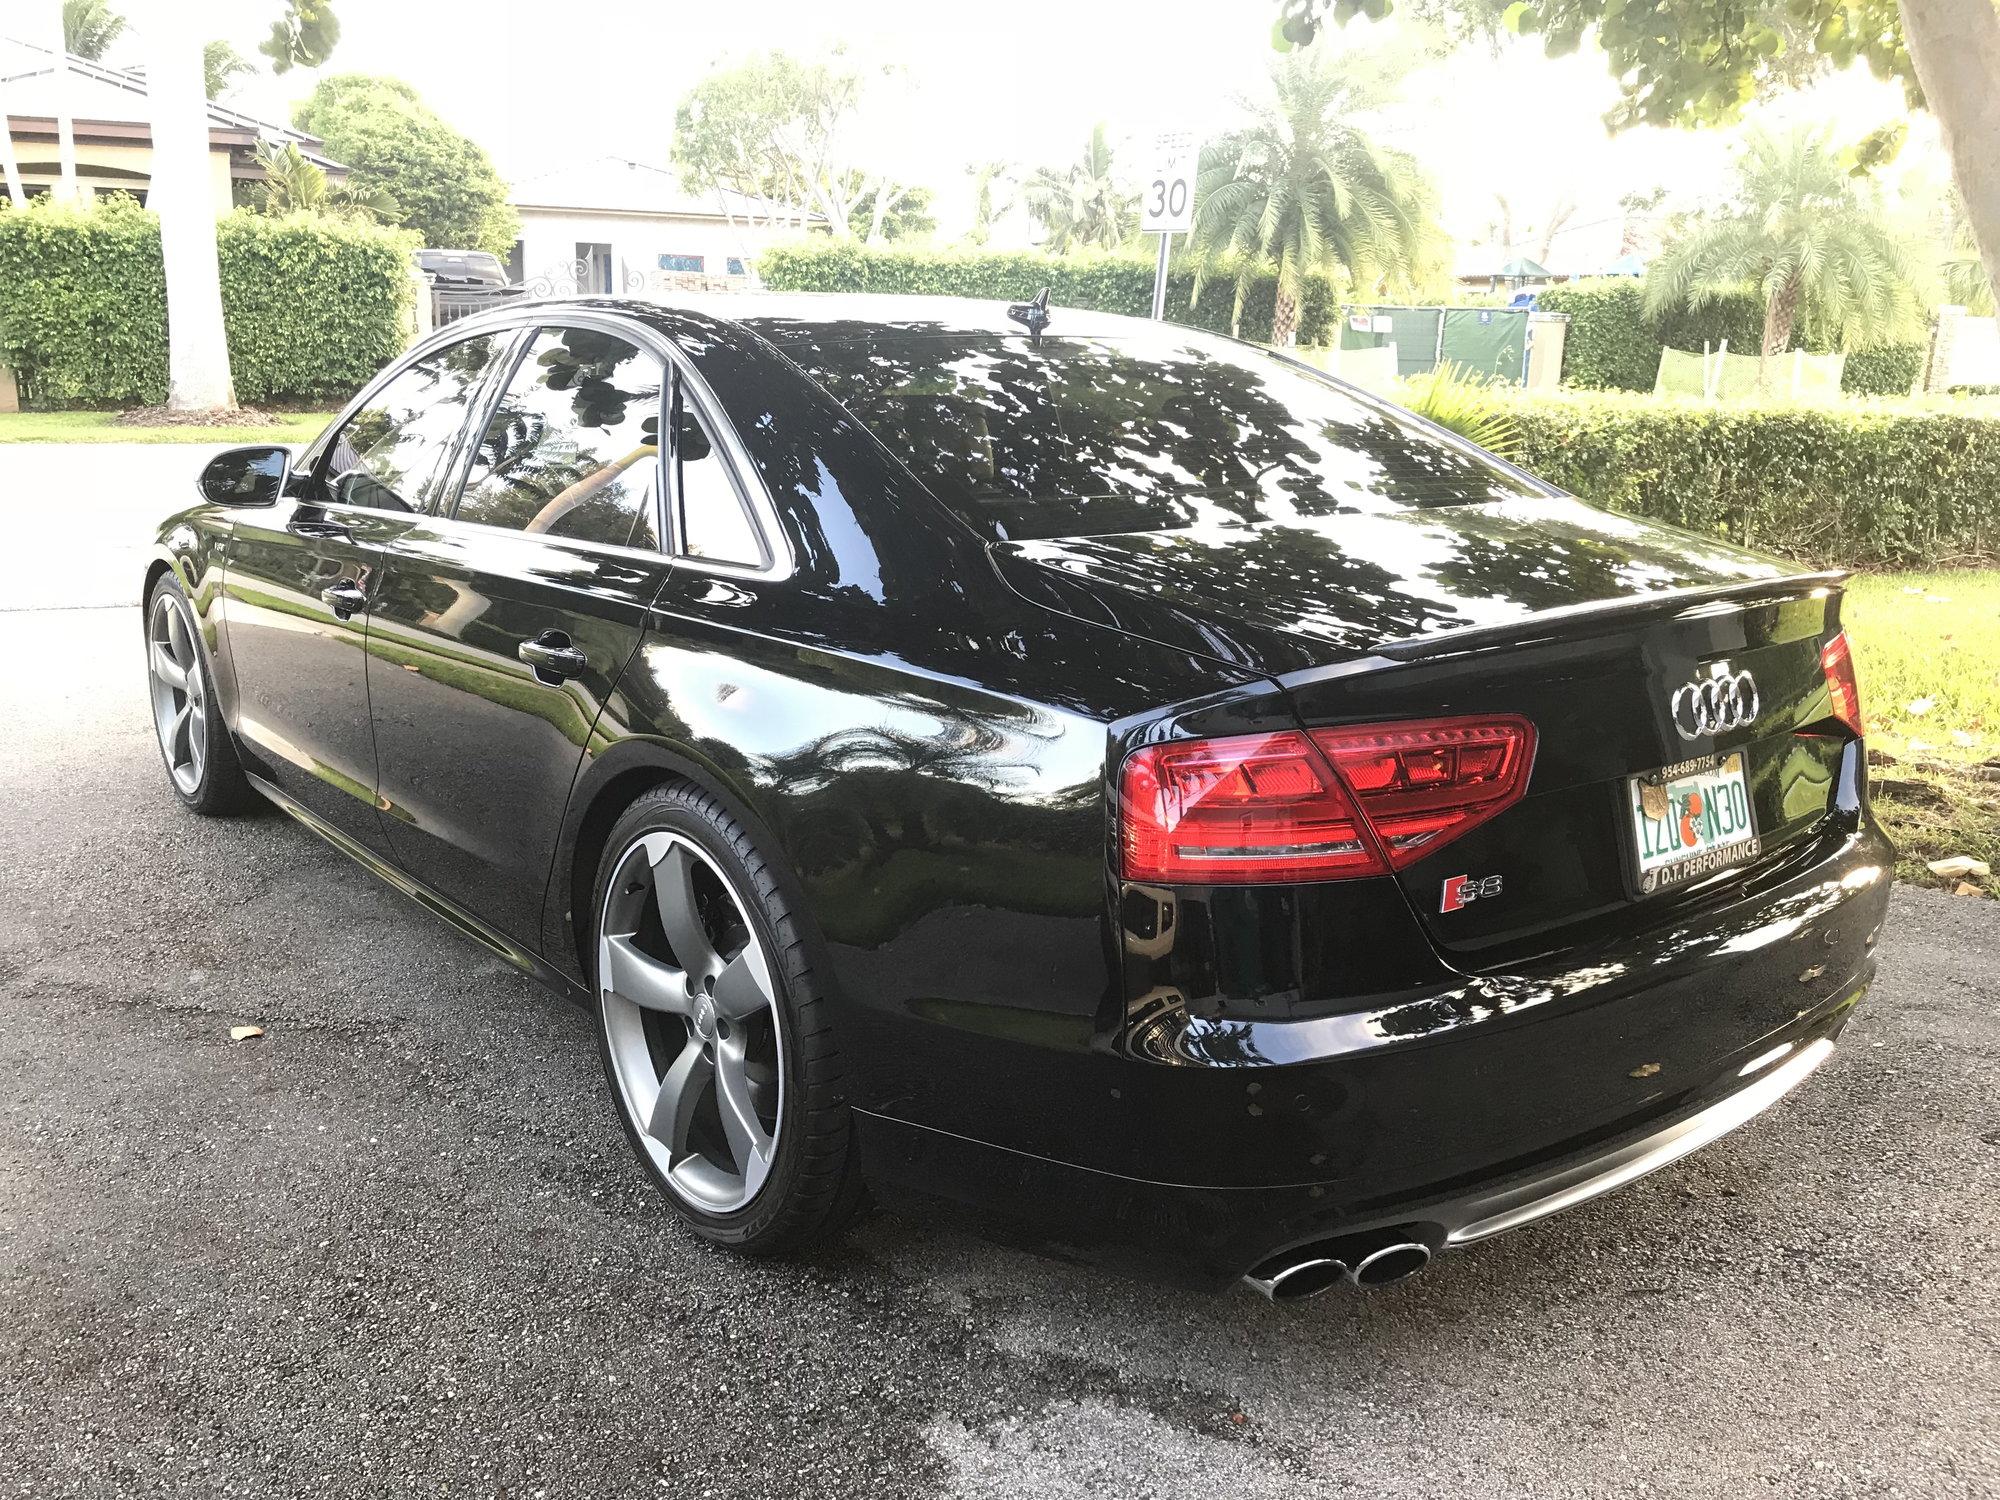 Audi Q7 Vcds Mods